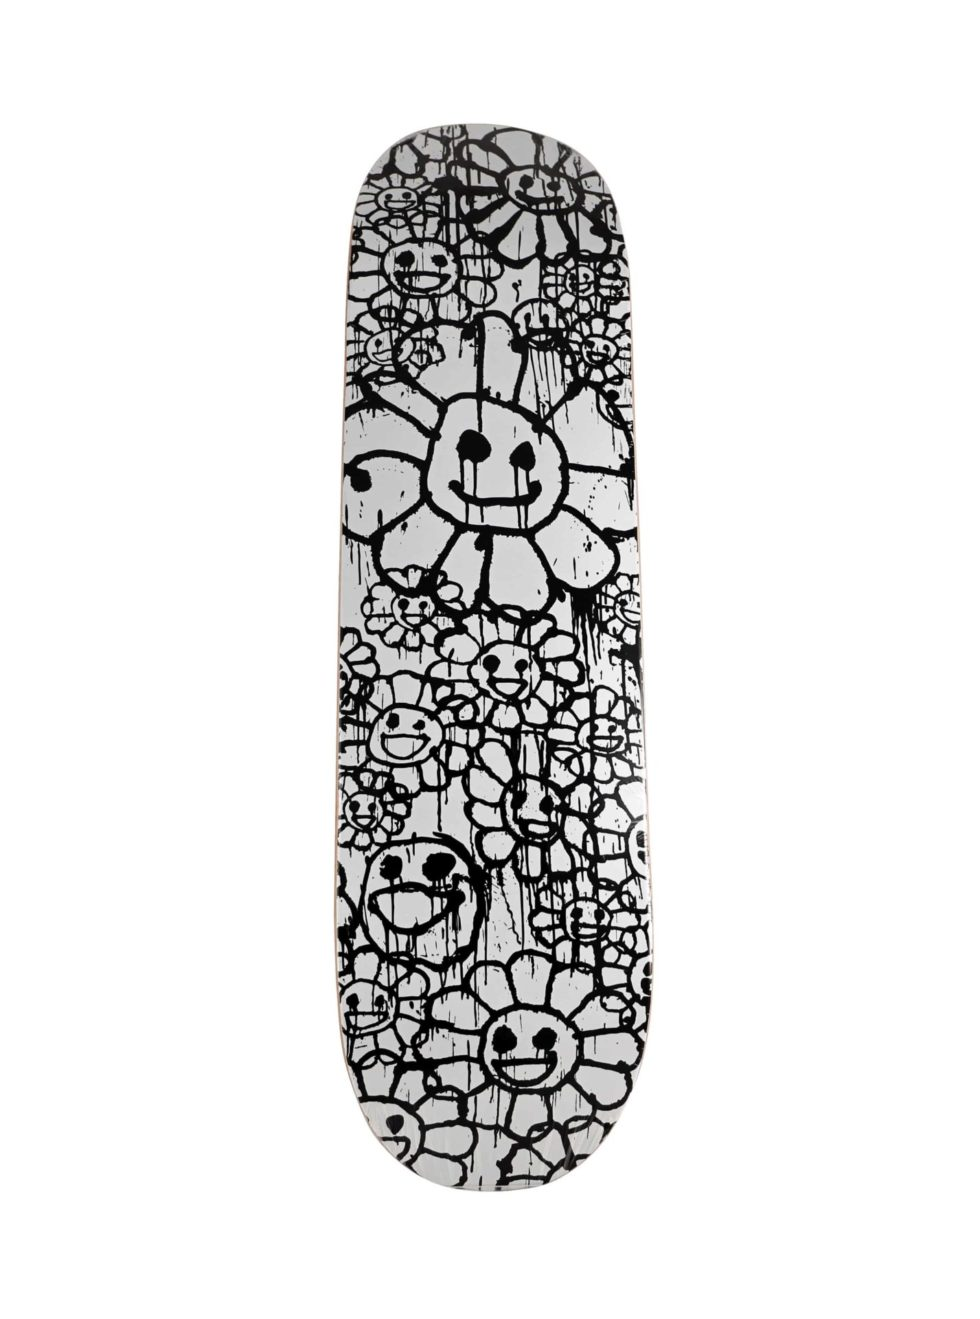 Lot #8758 – Murakami x Madsaki Flower White Black Skateboard Deck Madsaki Kaikai Kiki Deck